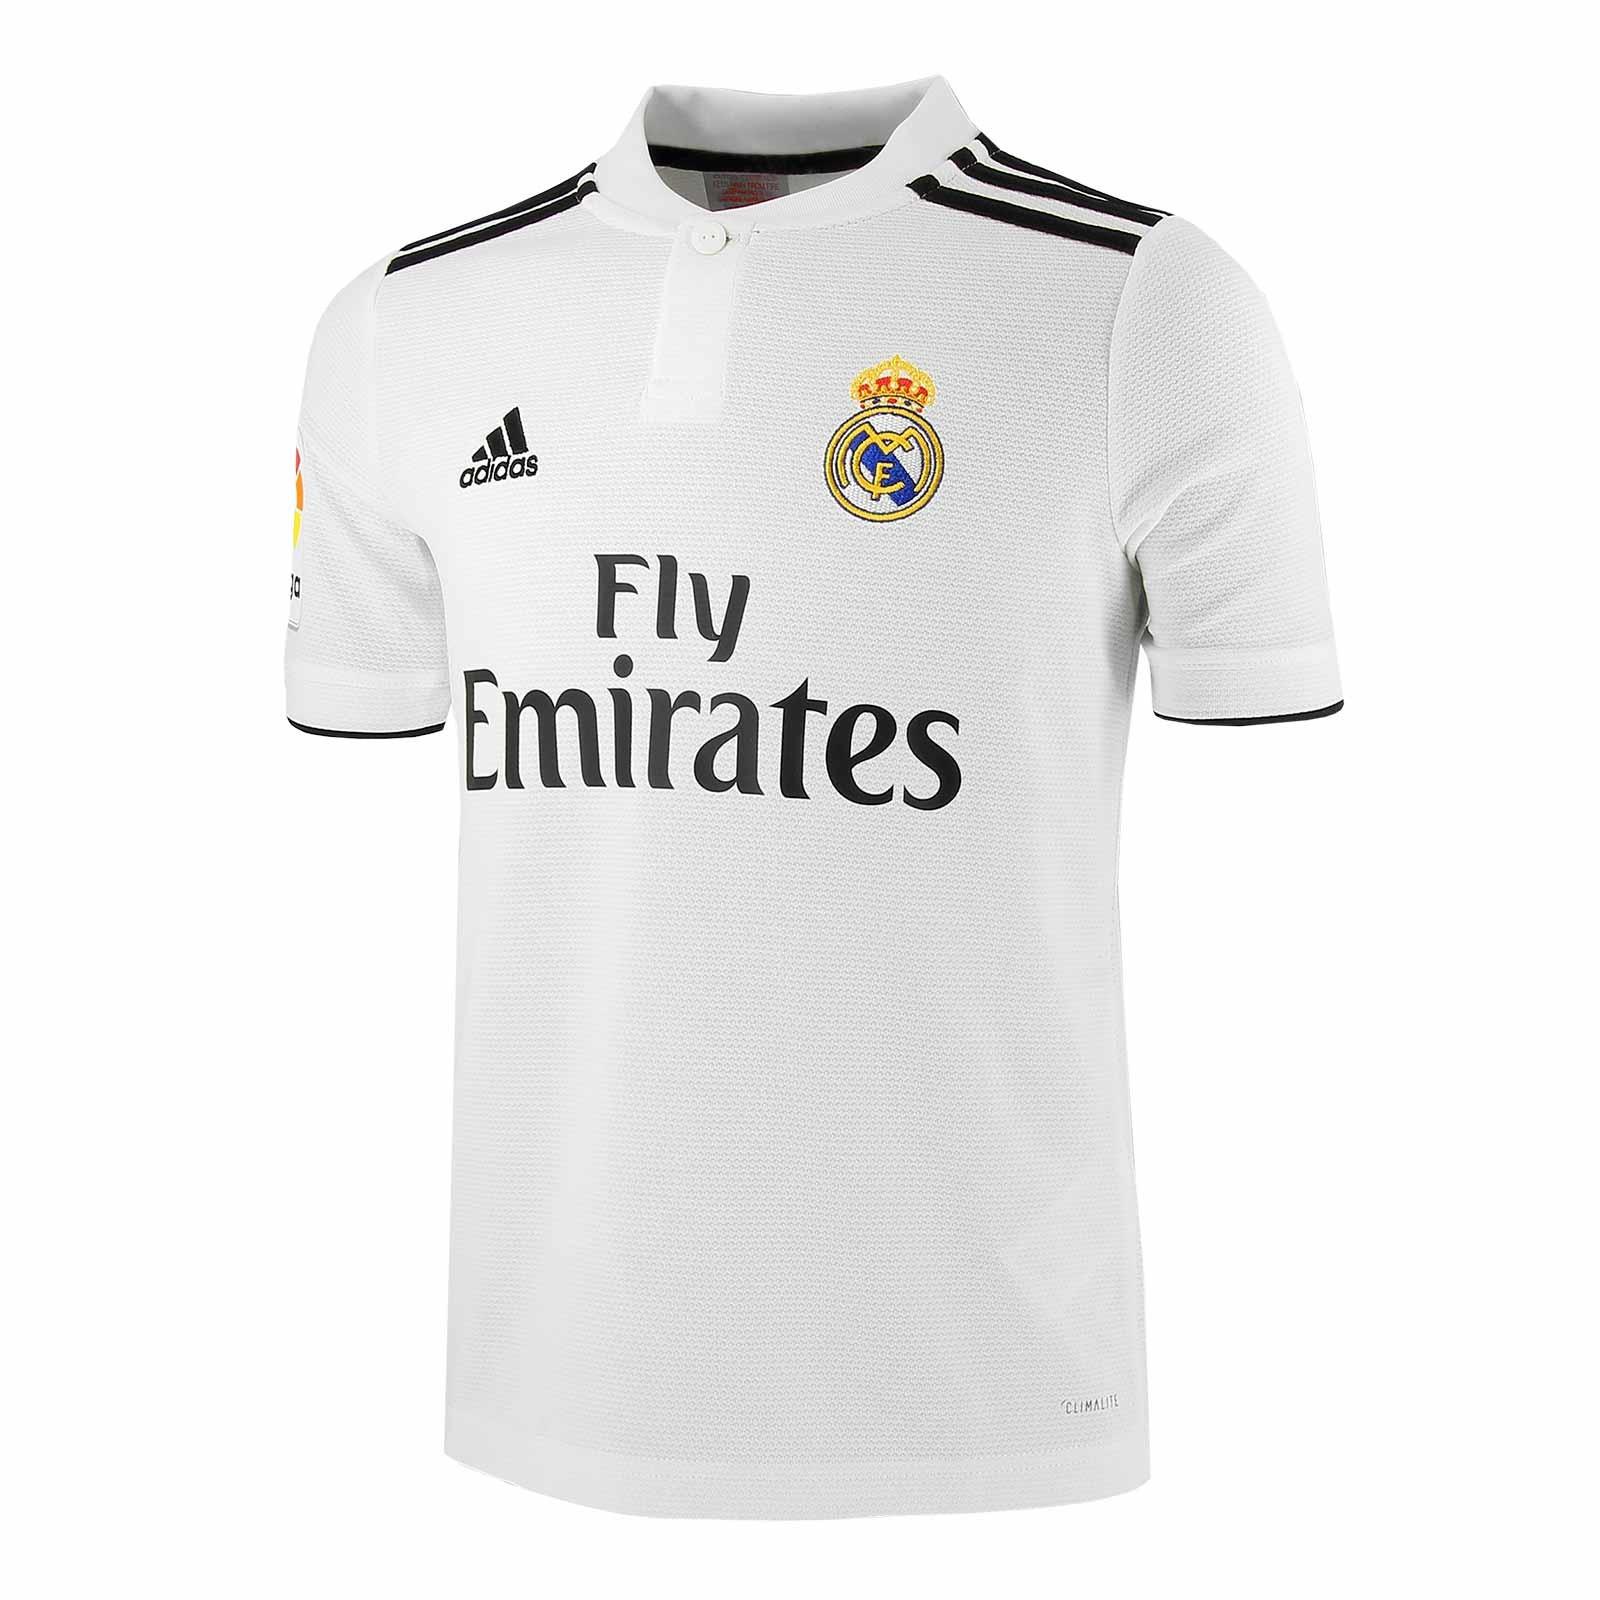 varios diseños fábrica nueva alta calidad Camiseta fútbol adidas Real Madrid 2018/19 1ª blanca junior ...